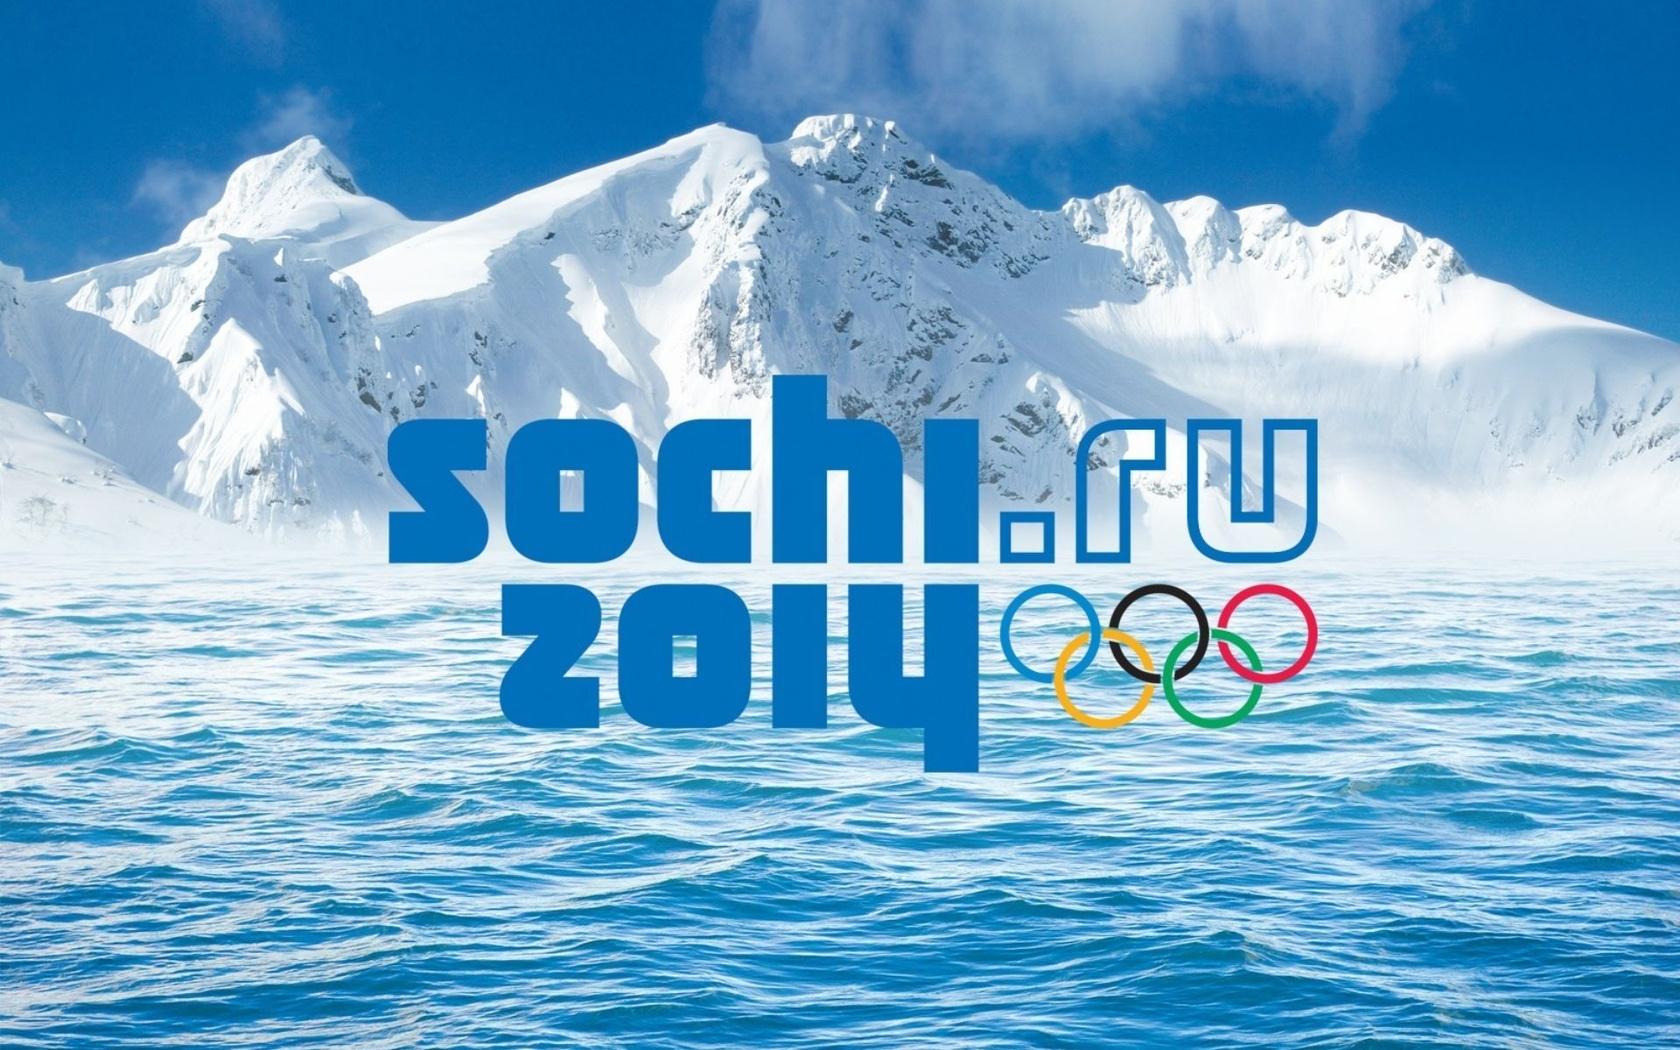 Сочи 2014 олимпиада олимпийские игры